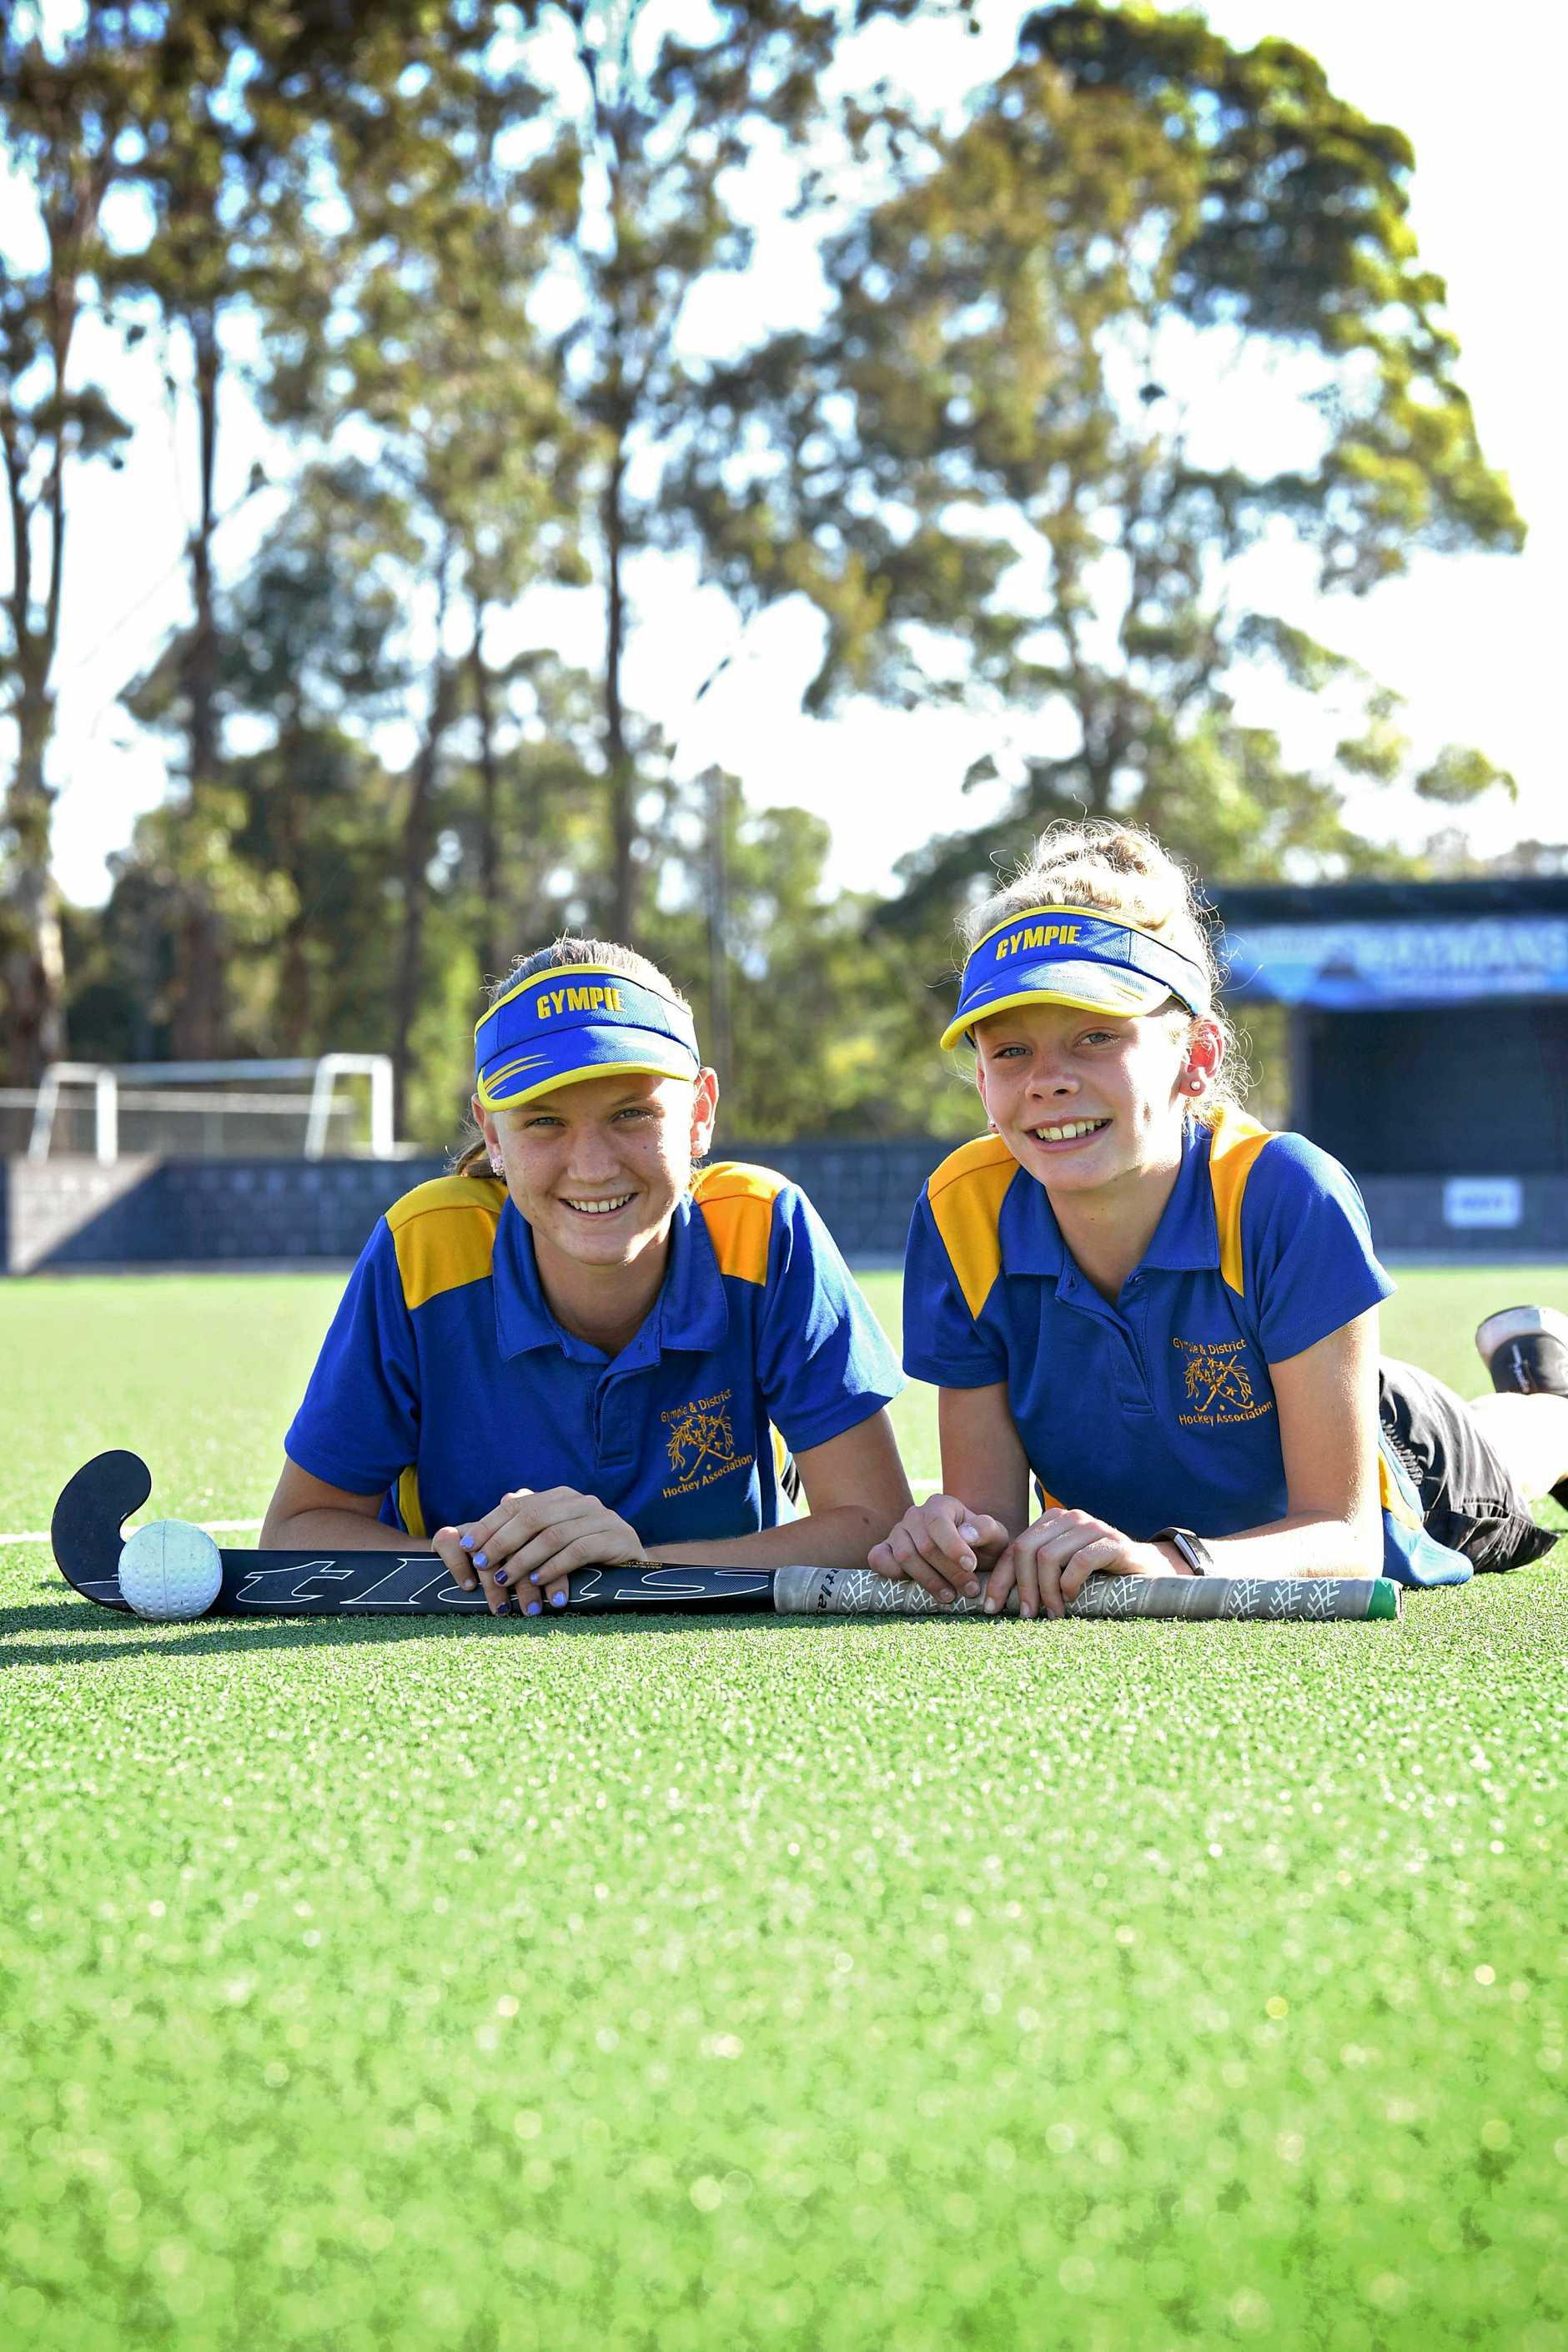 HOOKED ON HOCKEY: Jess Wilcox and Grace Dixon both enjoyed hooking into hockey last year.